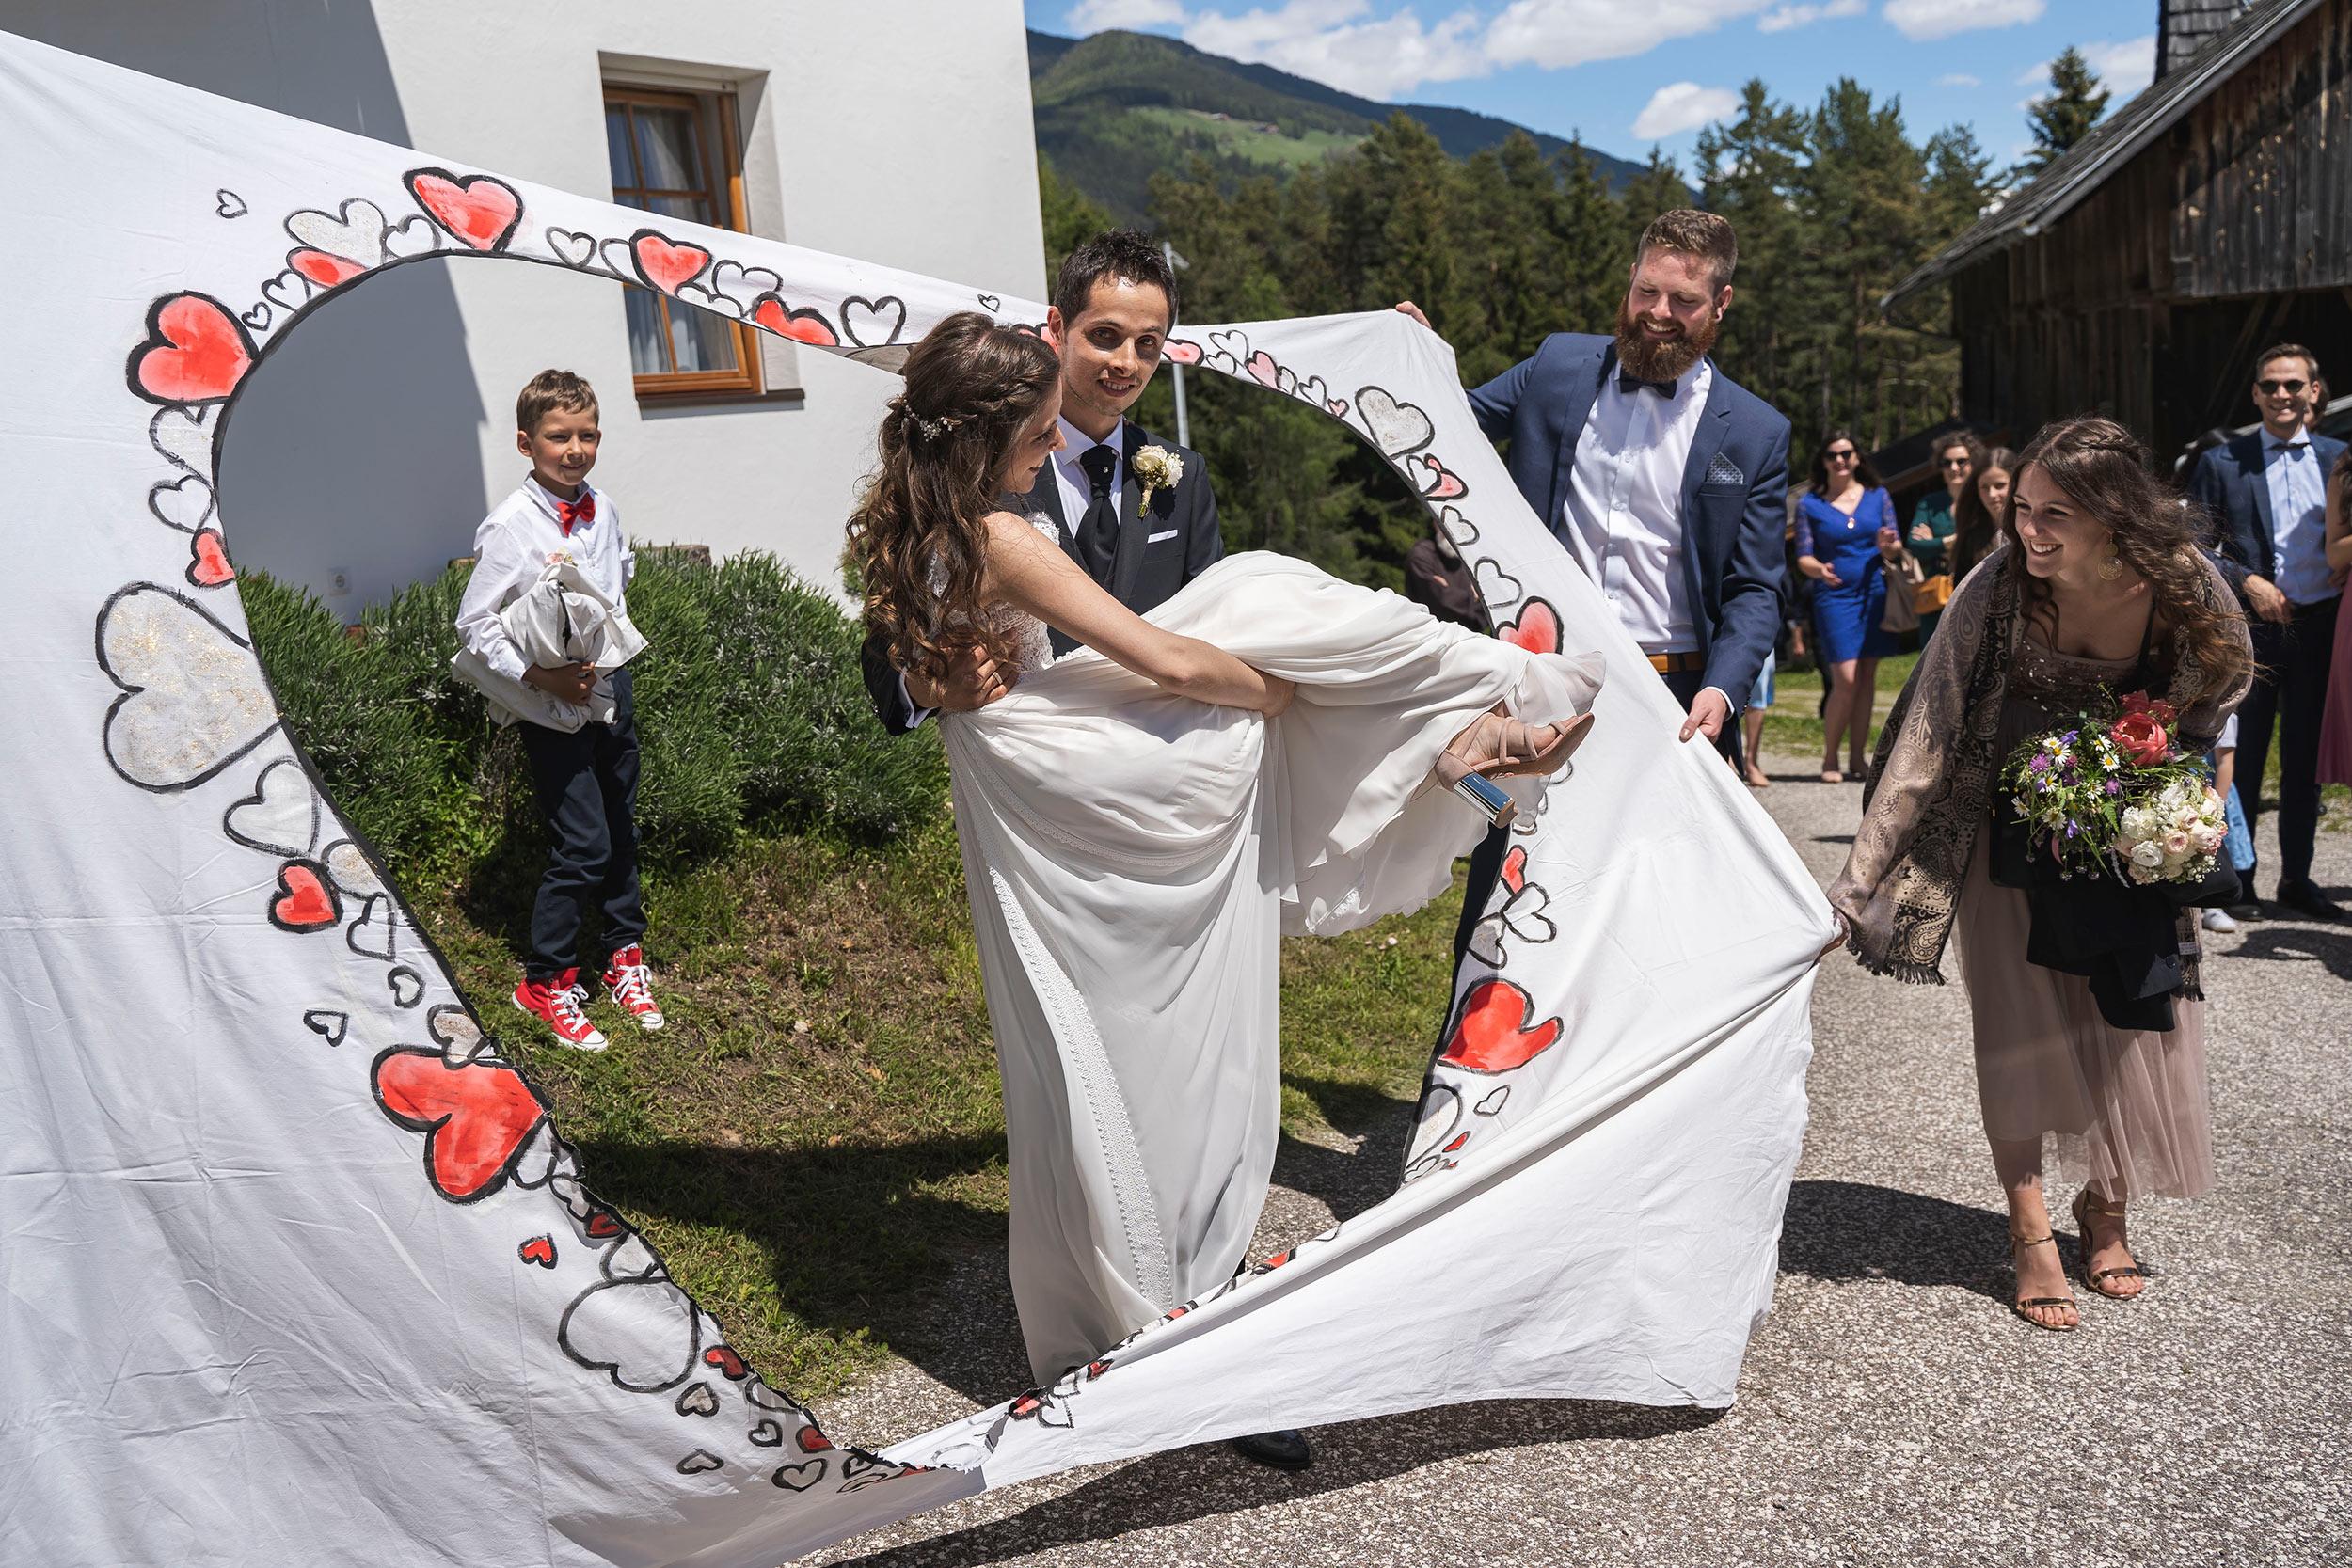 Evi_&_Christian_Hochzeit_01-06-2019_329